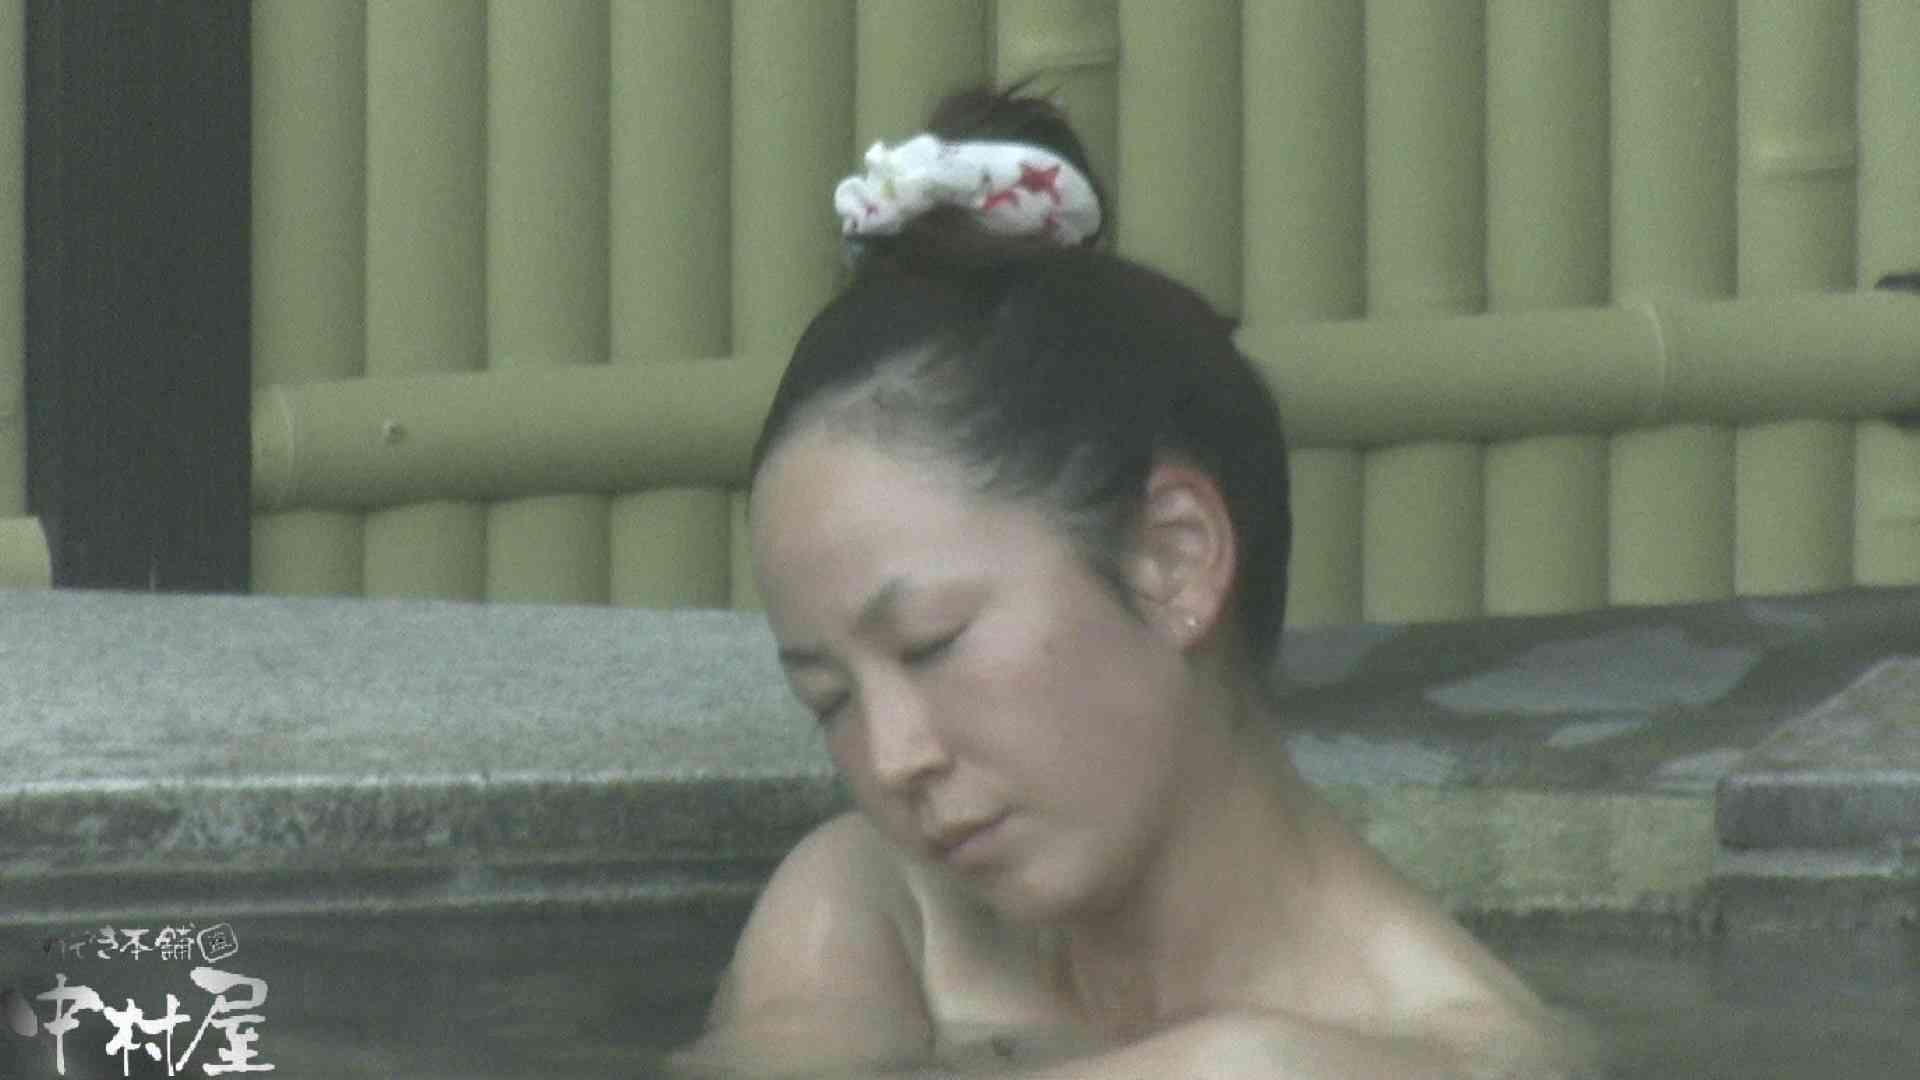 Aquaな露天風呂Vol.911 0   0  88連発 67